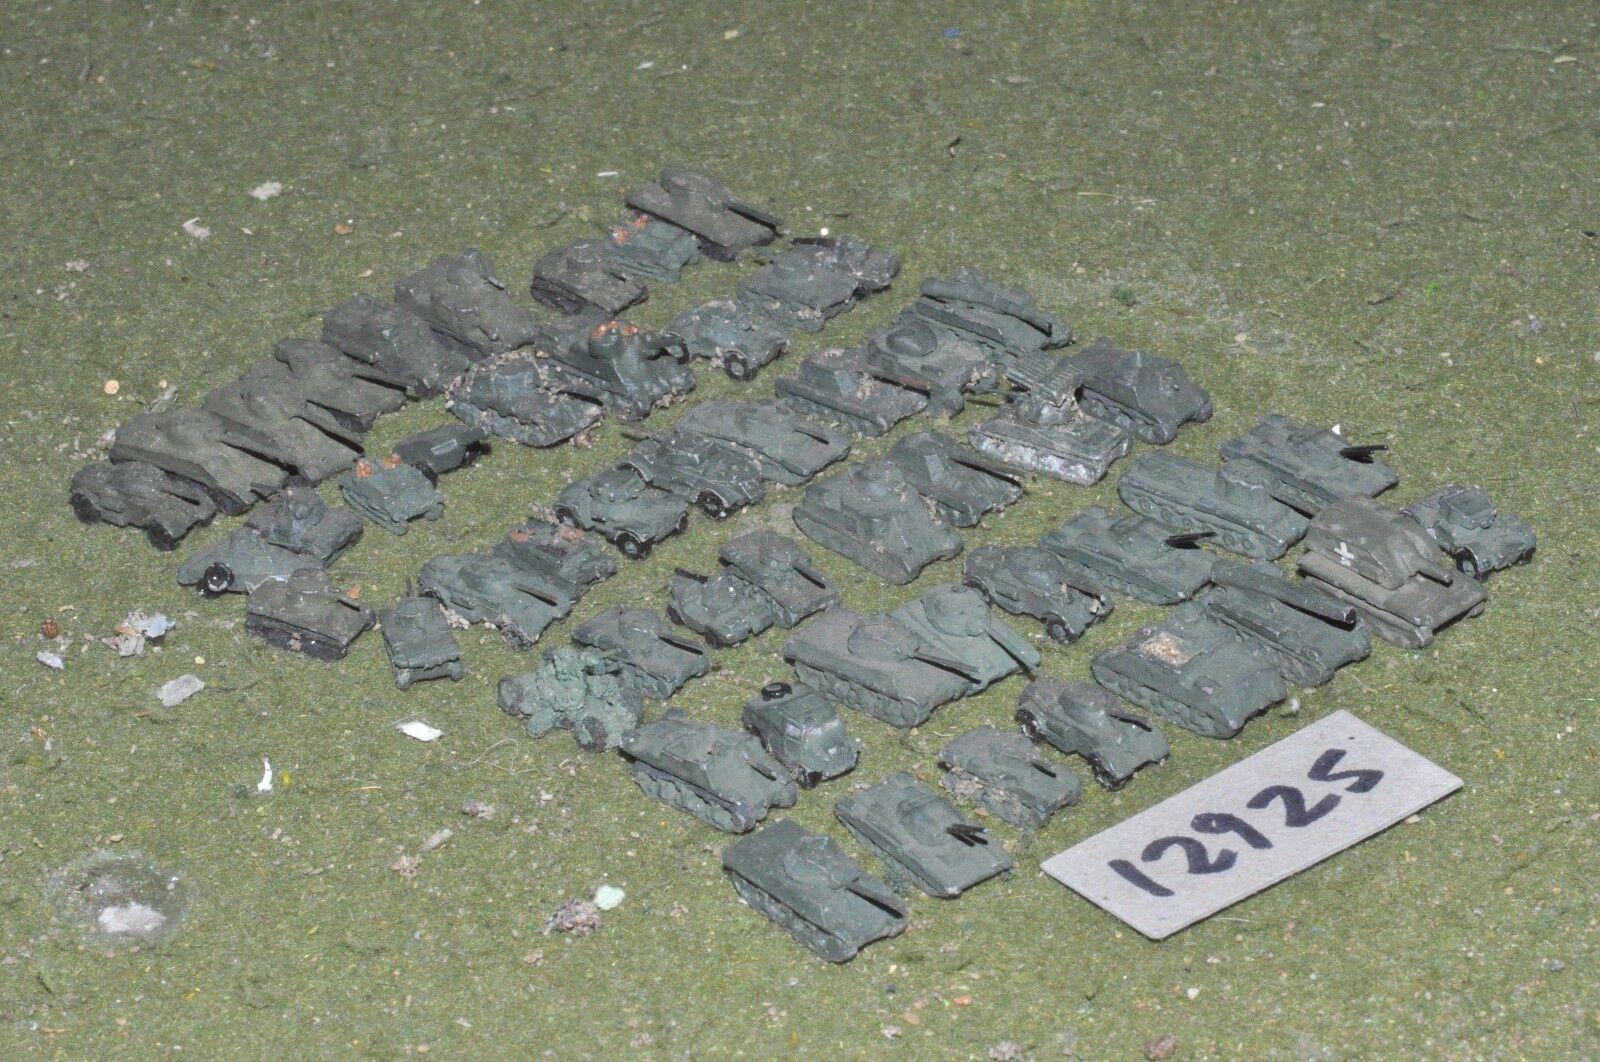 6mm WW2   British - 1 300 scale vehicles 48 vehicles - vehicles (12925)